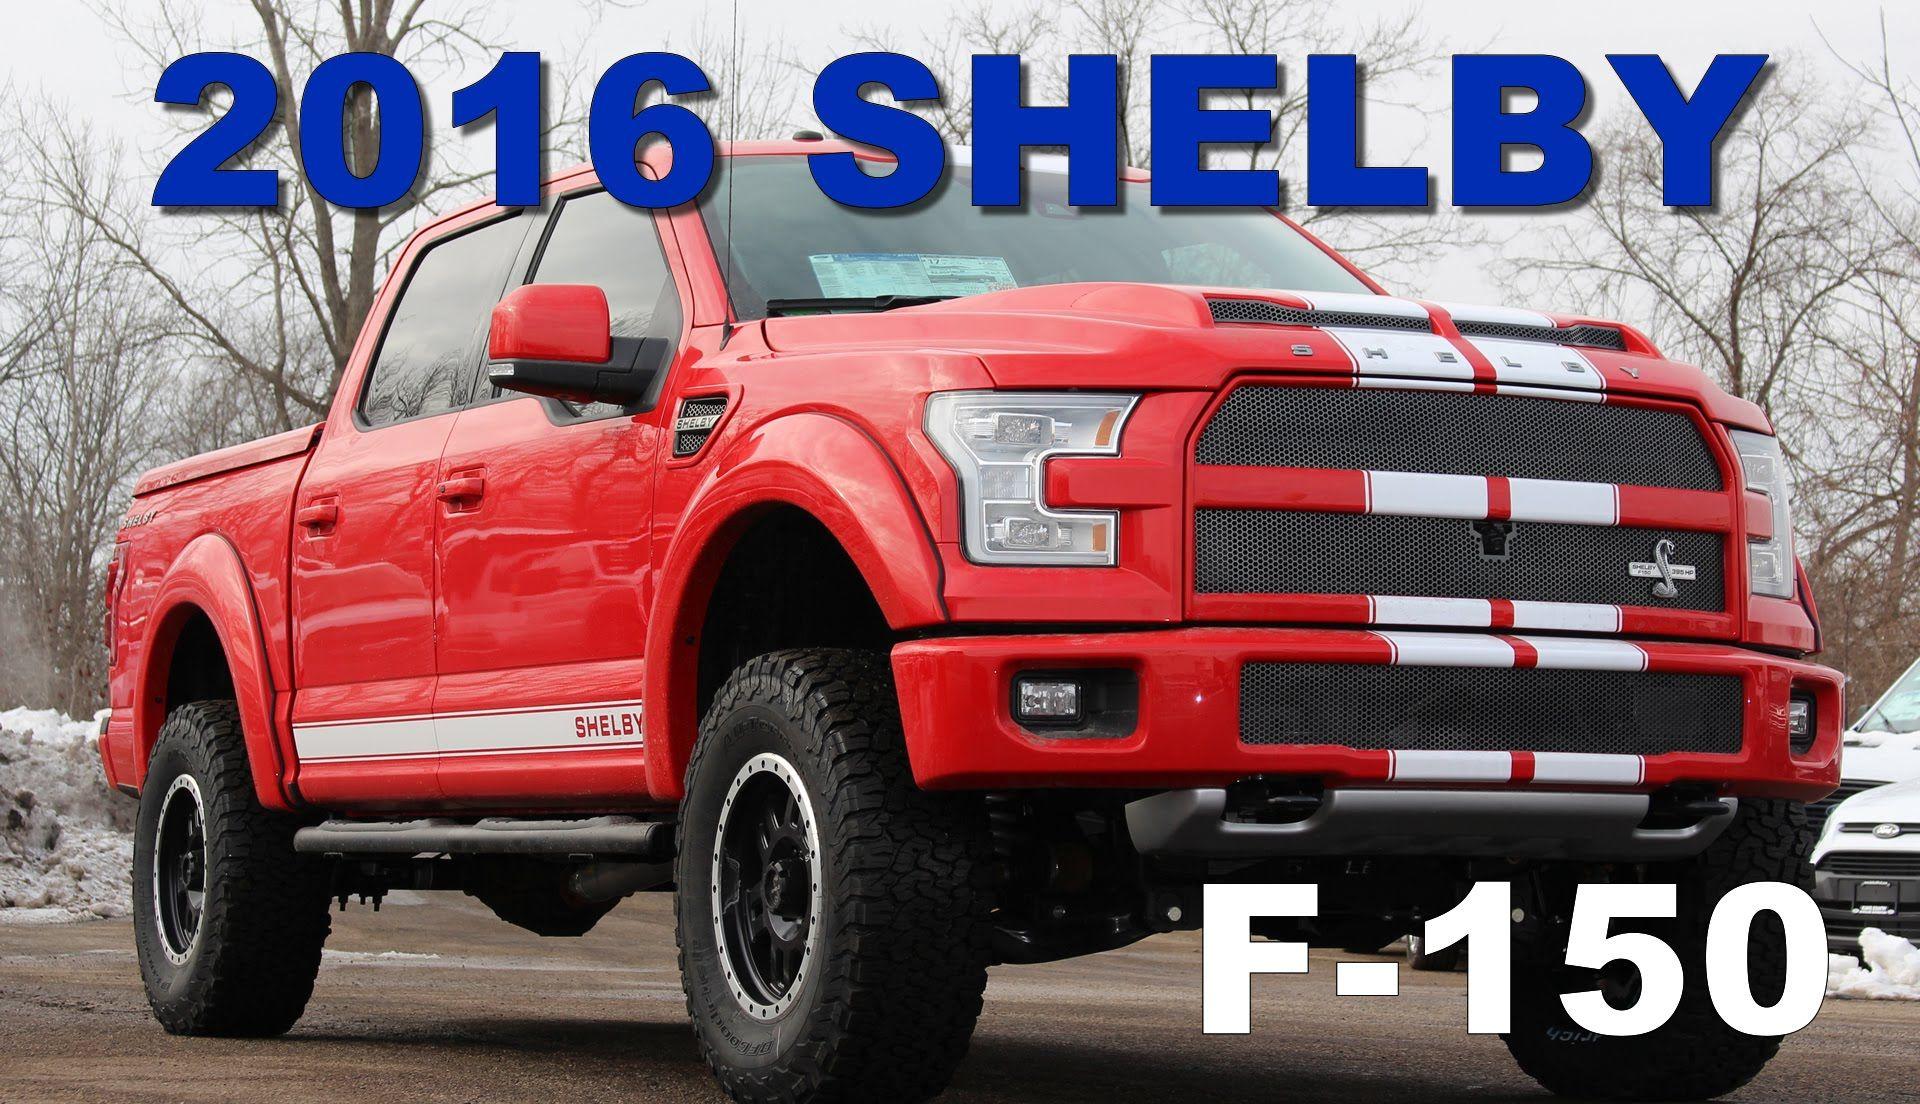 2016 shelby f150 Buscar con Google Camionetas Ford